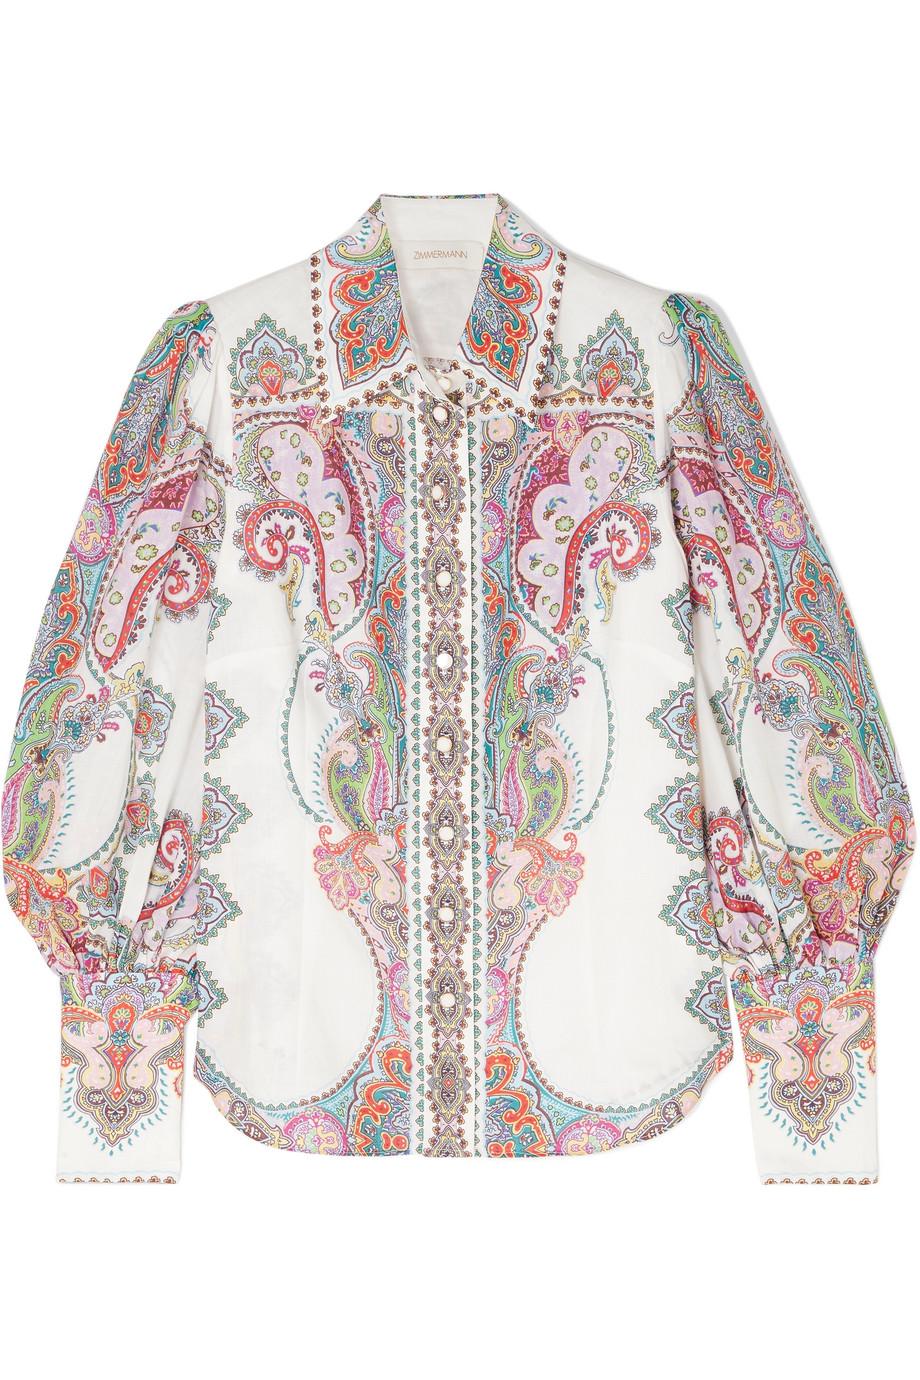 Ninety-six printed ramie shirt £430